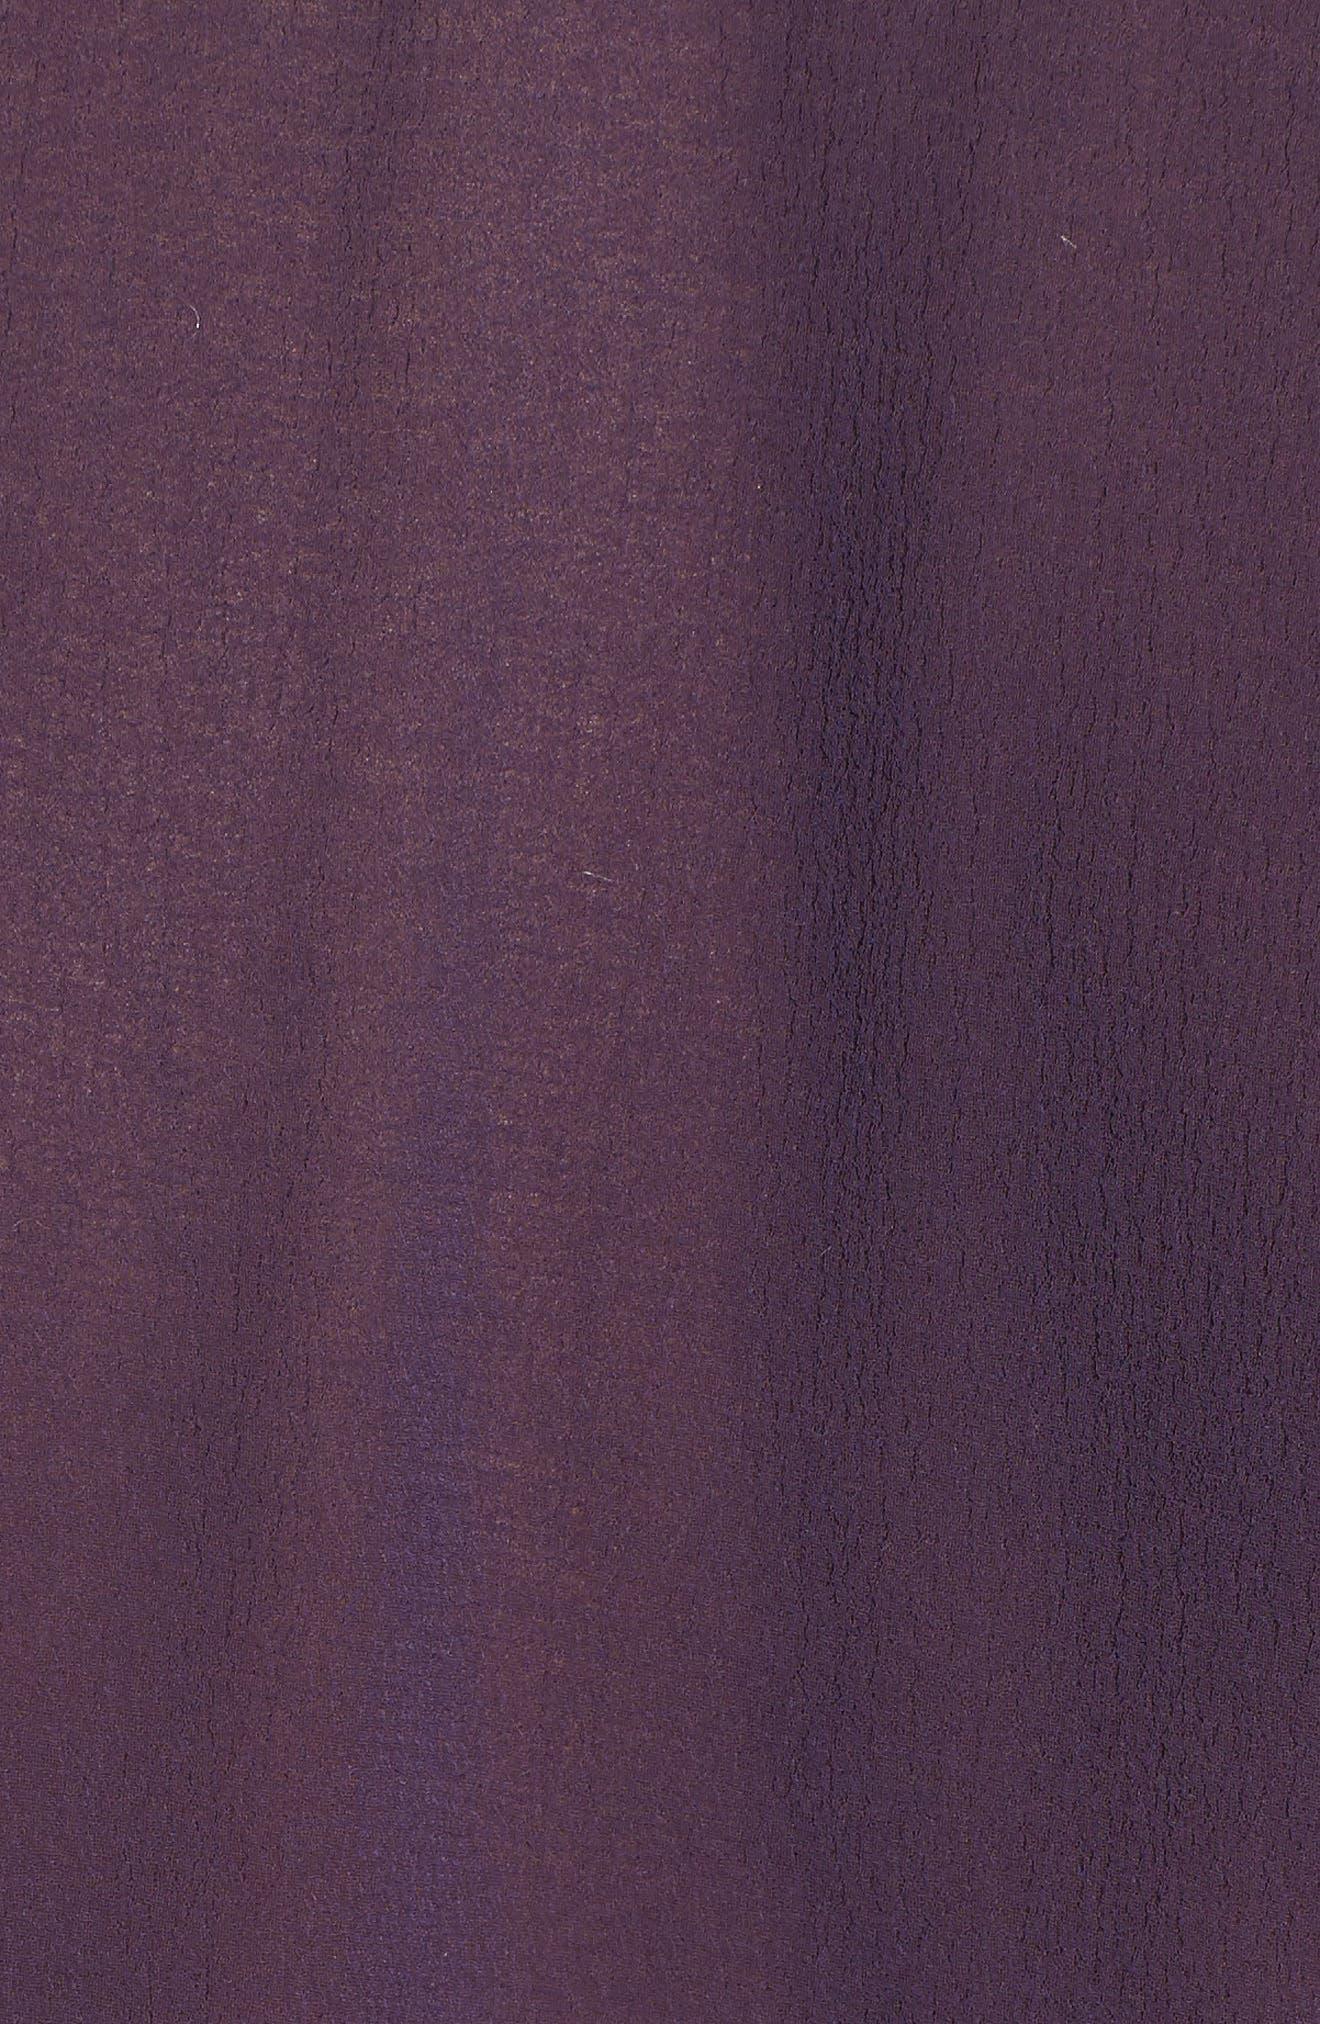 Lace Trim Top,                             Alternate thumbnail 5, color,                             PURPLE NIGHT